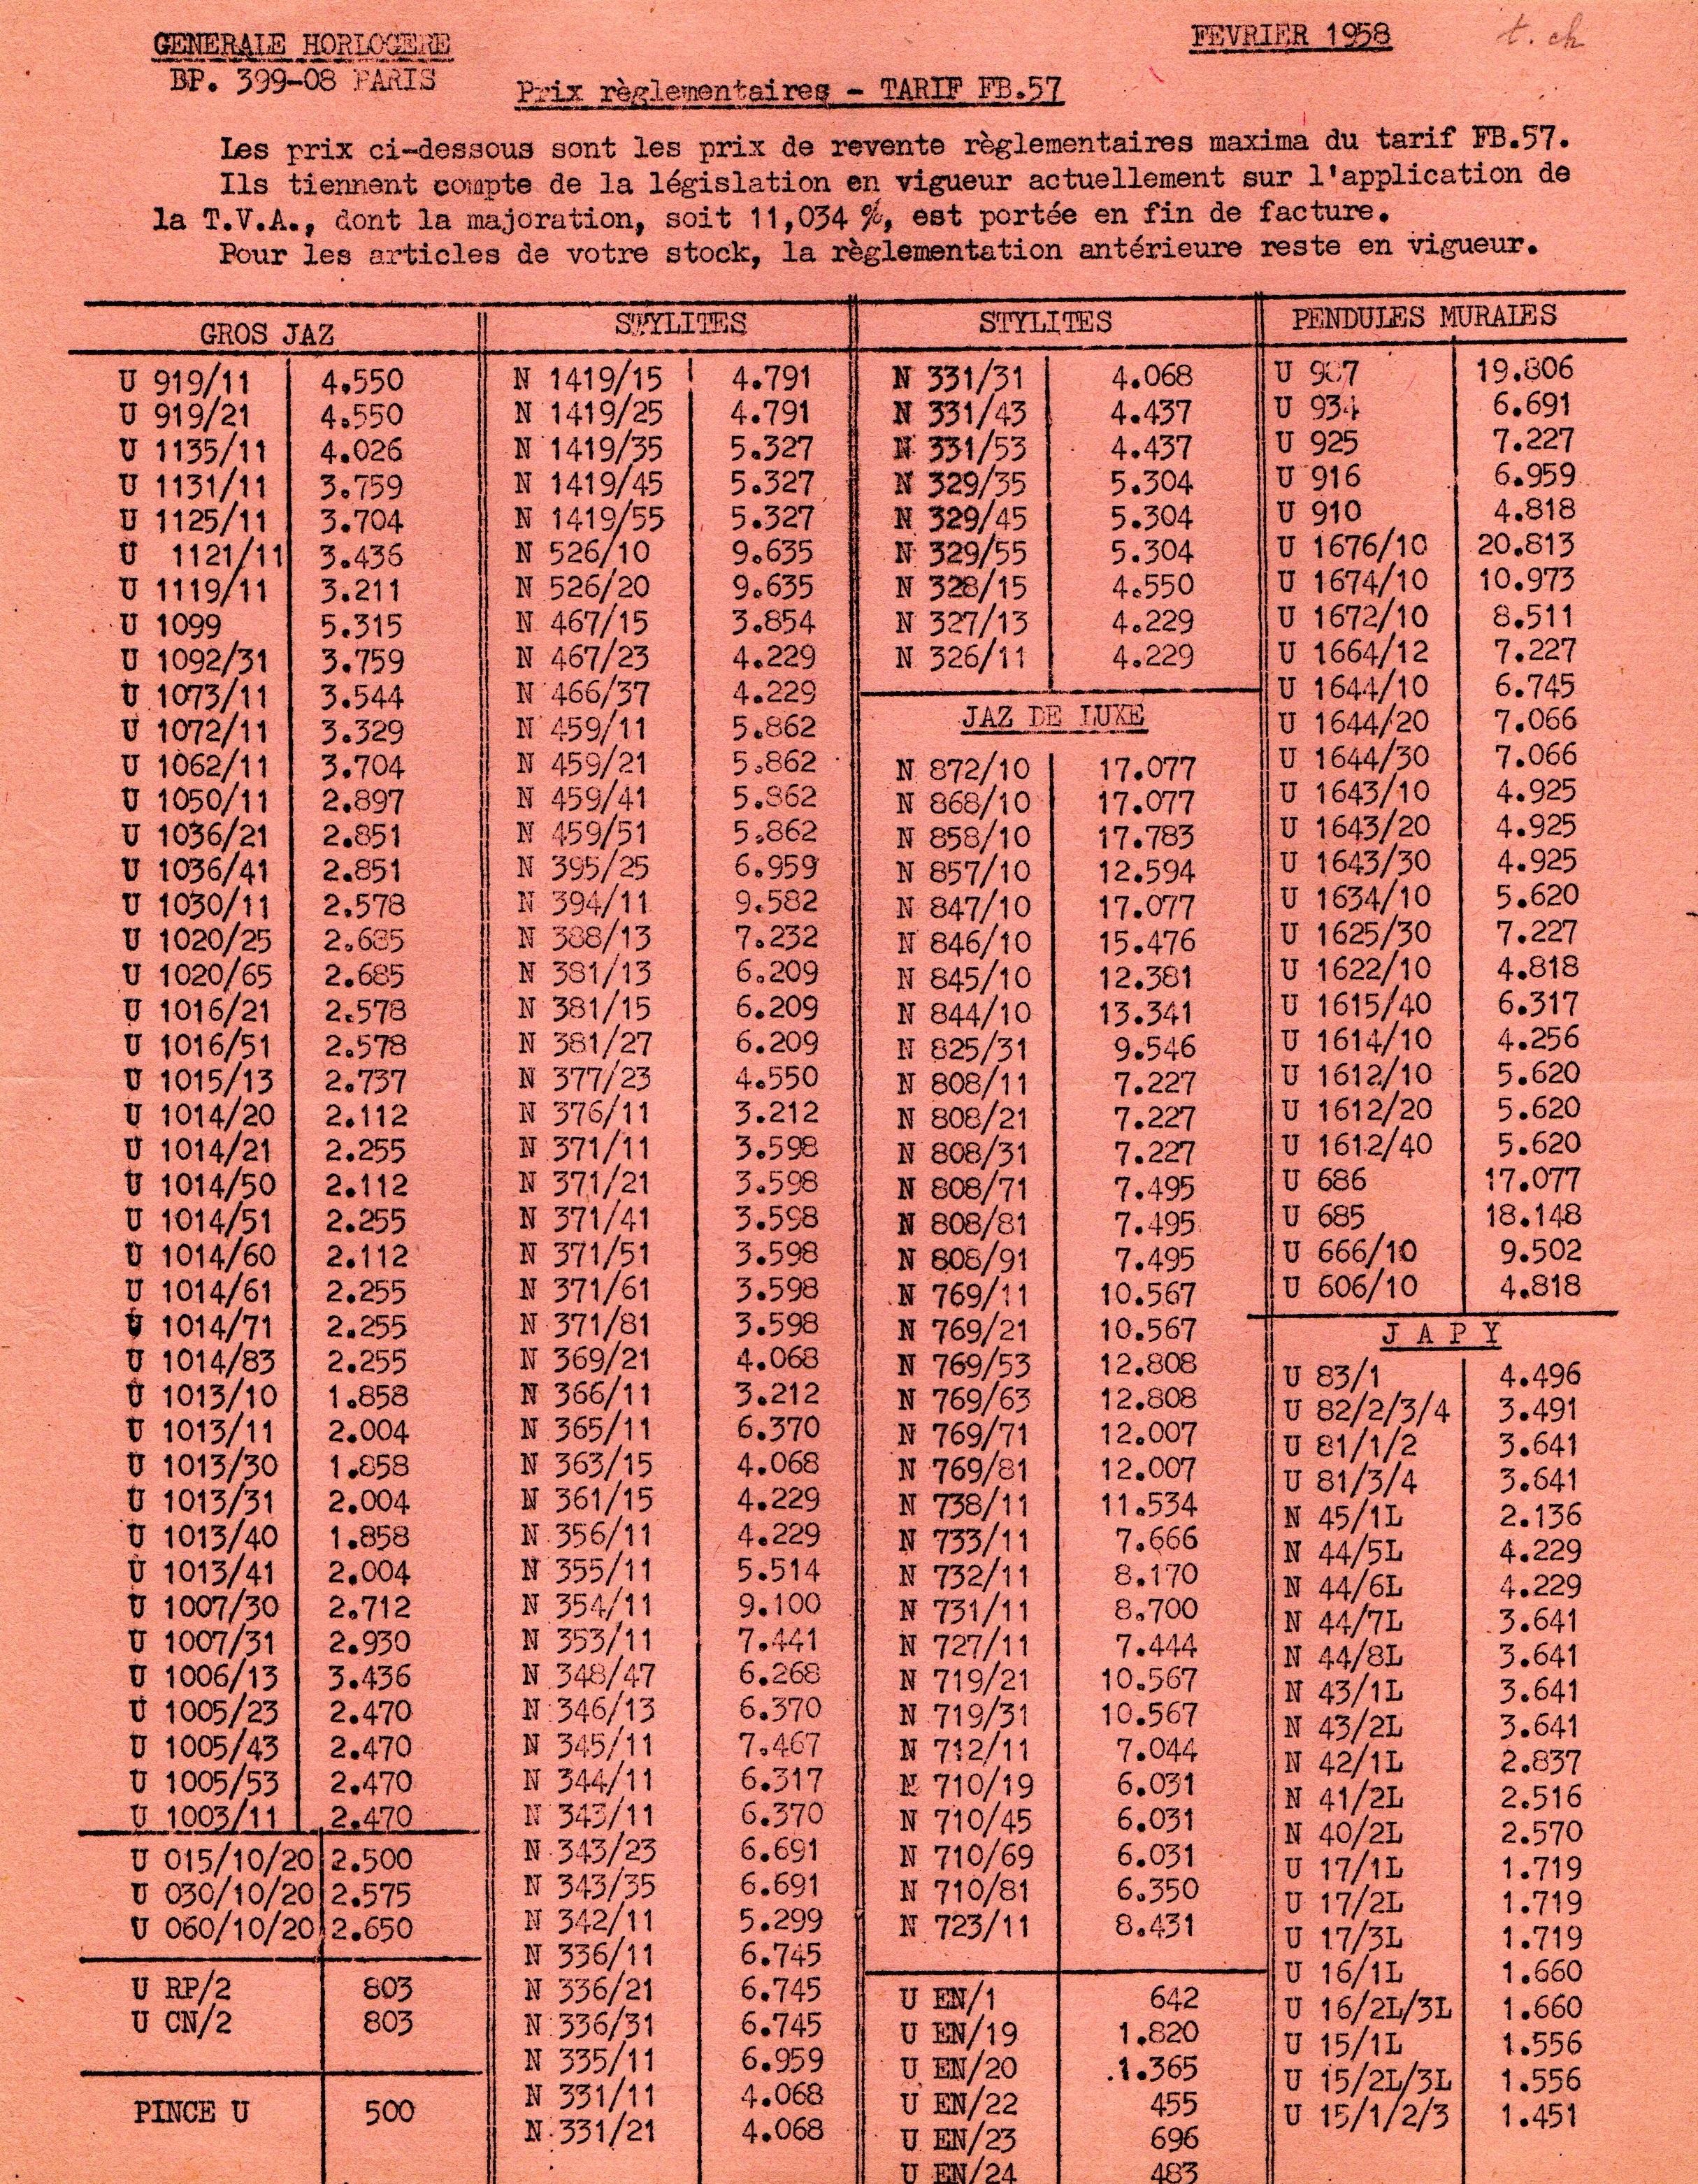 1958 tarif FB 57 février 58